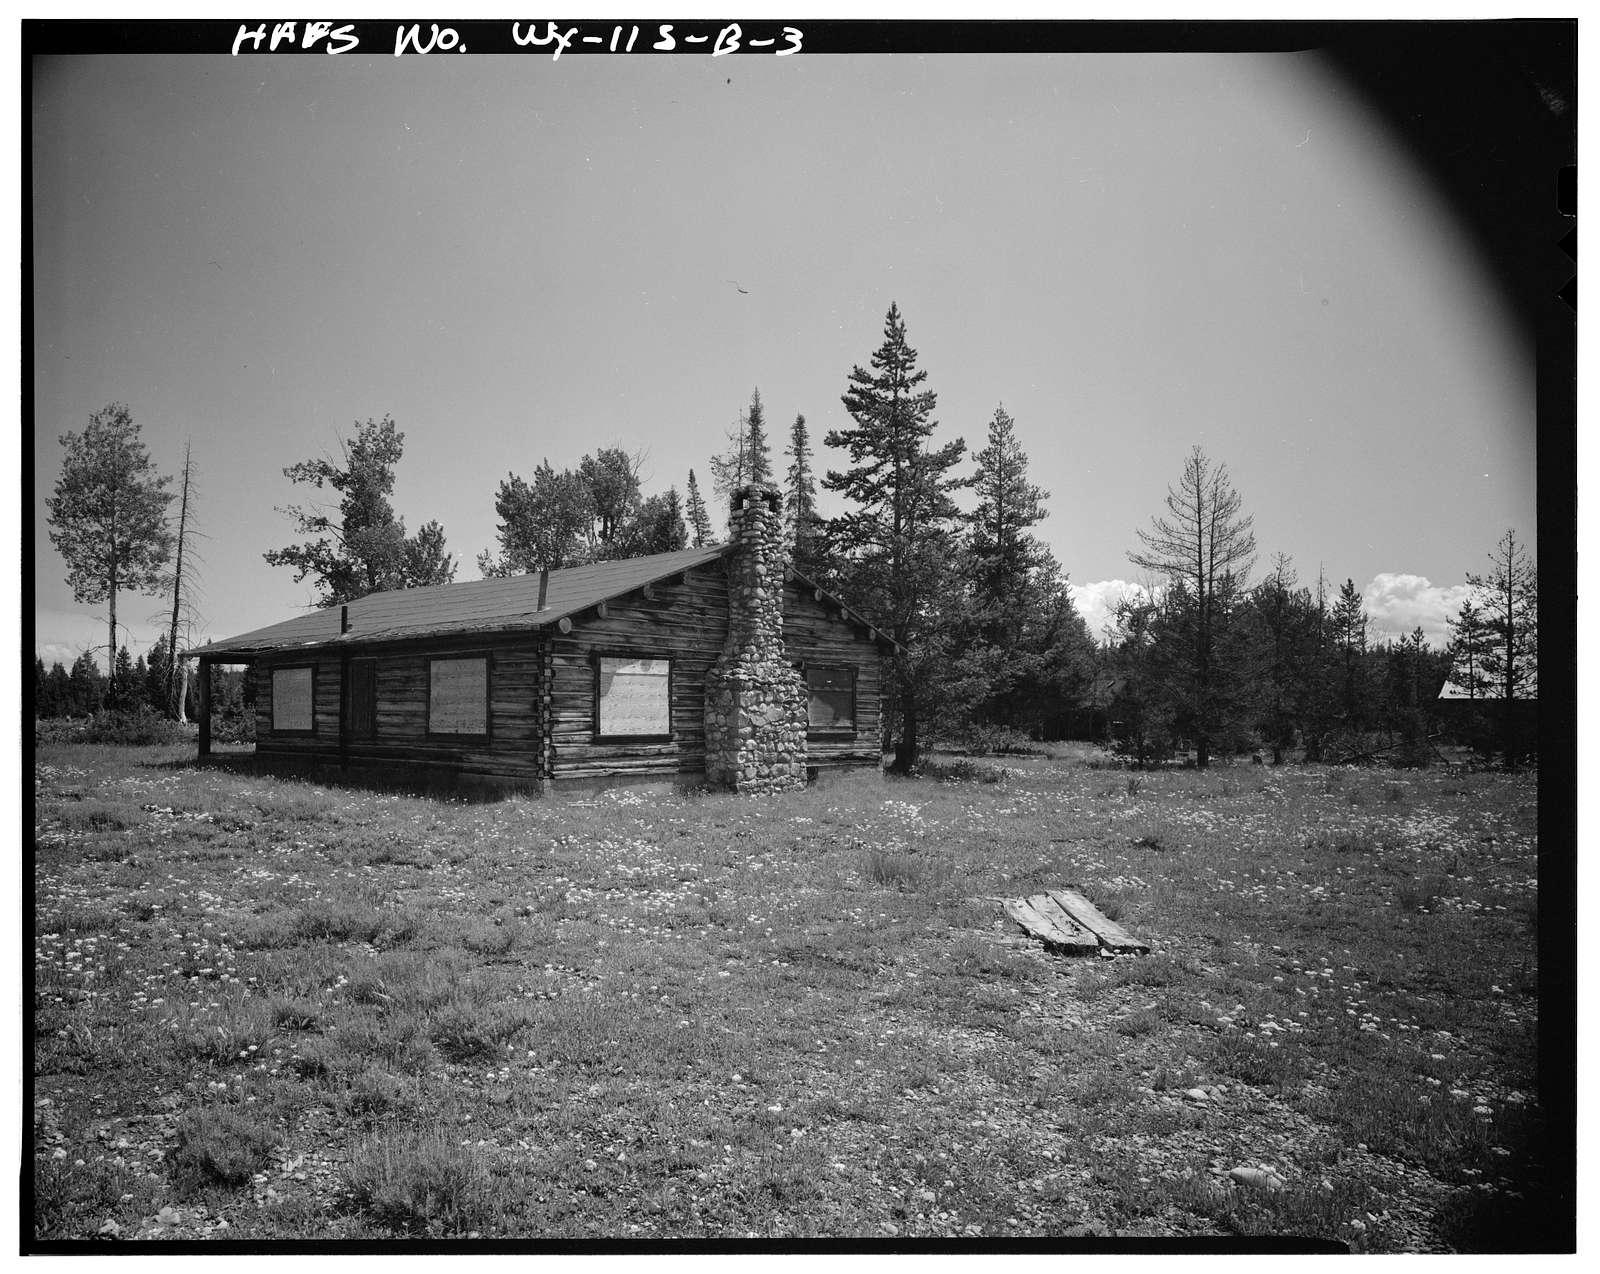 Geraldine Lucas Homestead, Russell Lucas Cabin, West bank Cottonwood Creek, 2.5 miles downstream from Jenny Lake, Moose, Teton County, WY